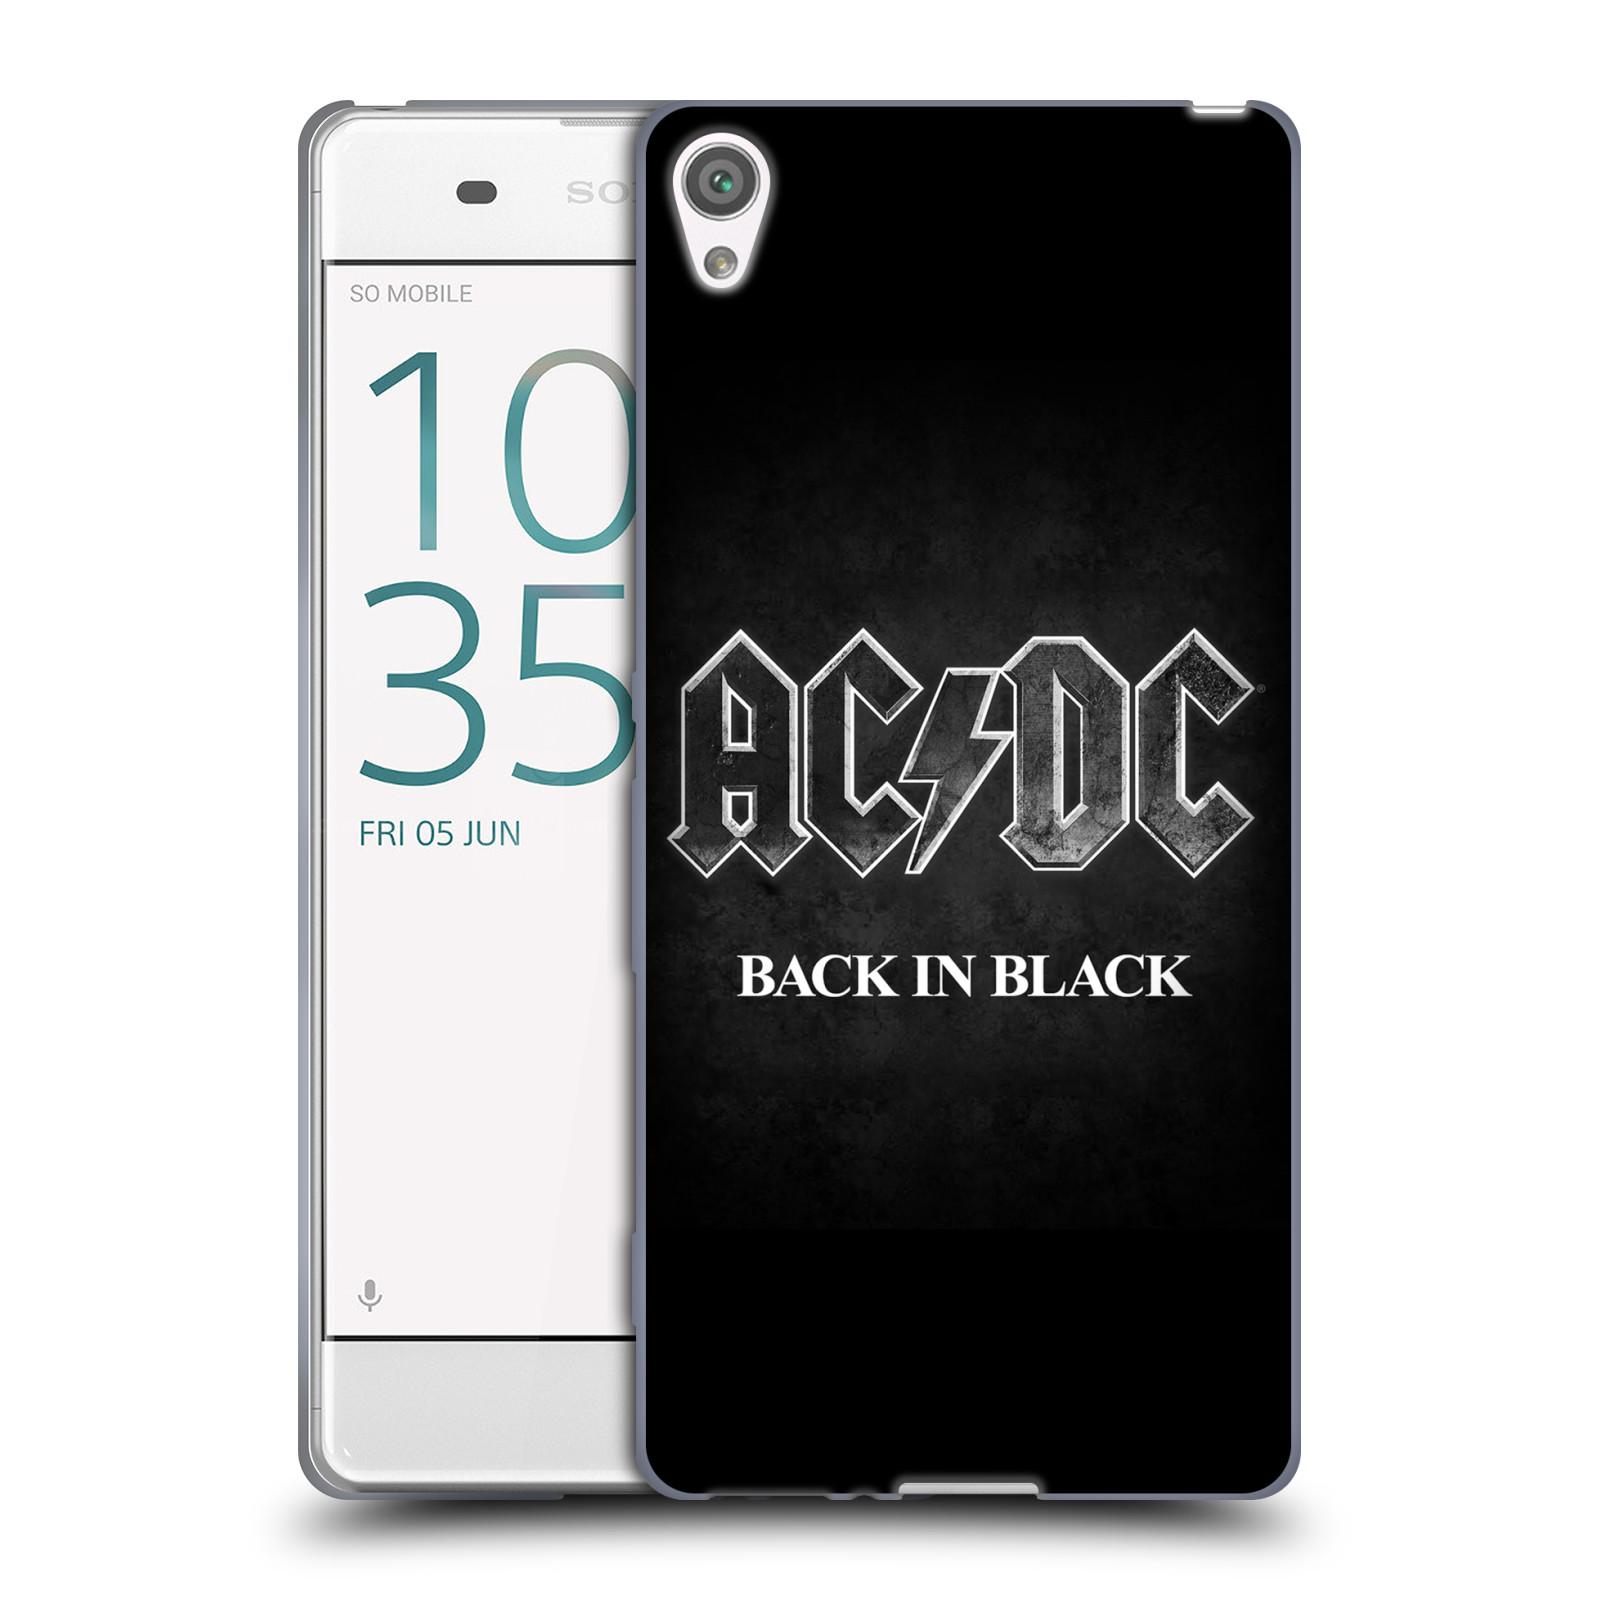 Silikonové pouzdro na mobil Sony Xperia XA HEAD CASE AC/DC BACK IN BLACK (Silikonový kryt či obal na mobilní telefon s oficiálním motivem australské skupiny AC/DC pro Sony Xperia XA F3111 / Dual SIM F3112)